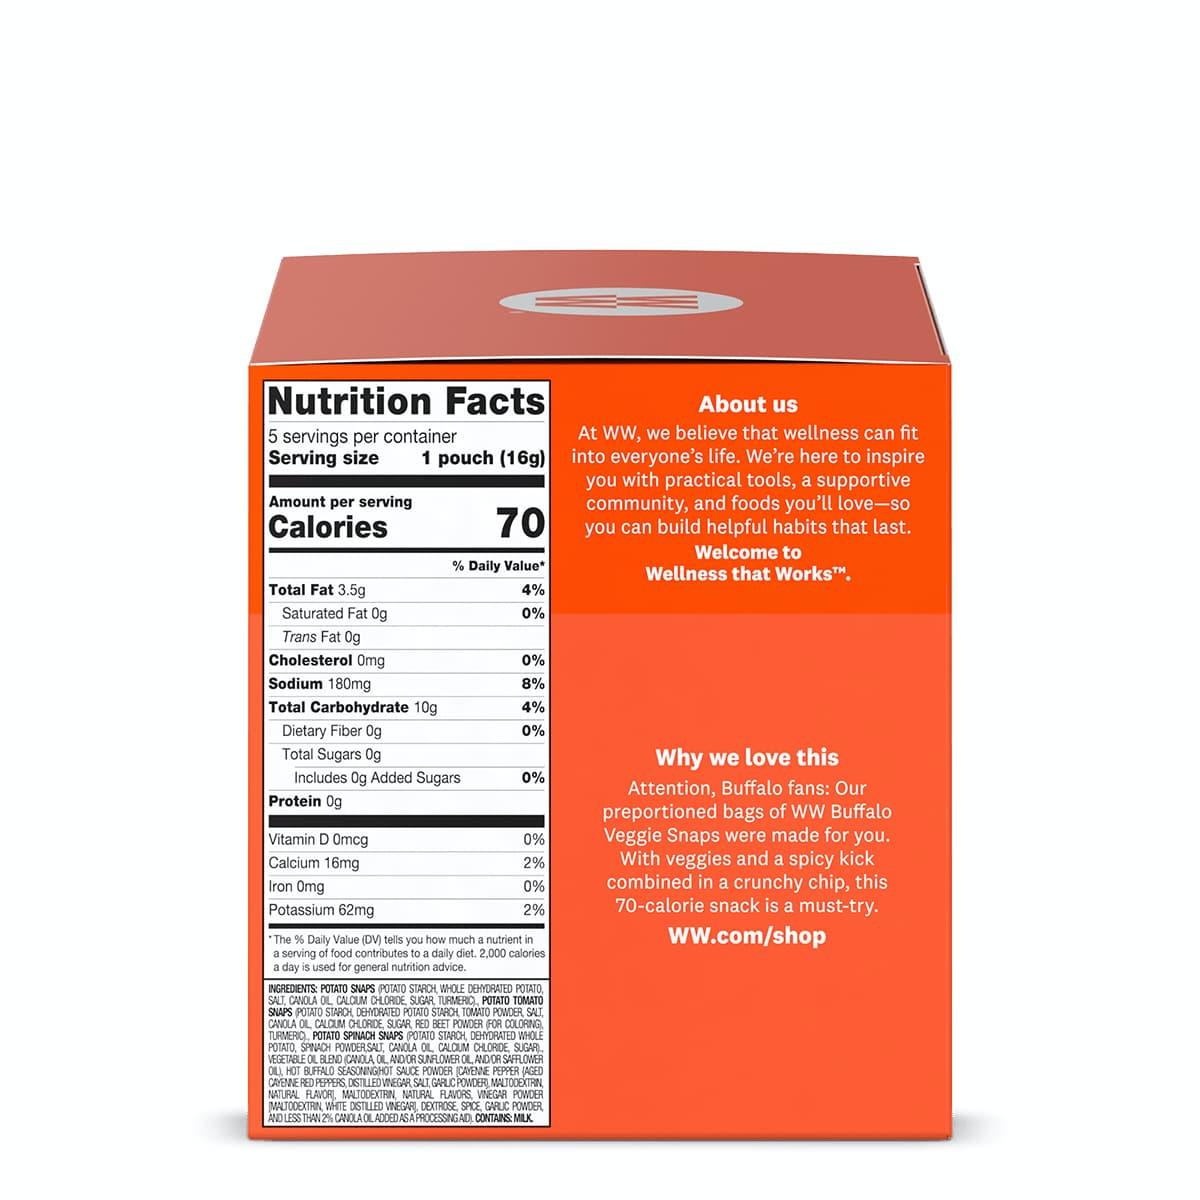 Buffalo Veggie Snaps - side of box, nutritional information